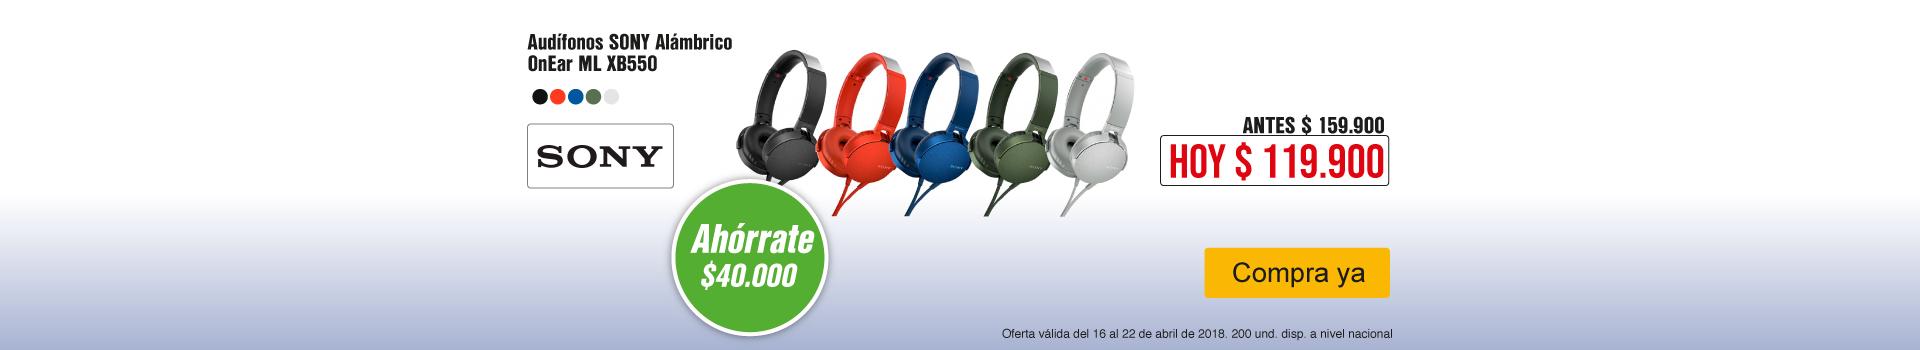 AK-KT-HIPER-5-accesorios-PP---Sony-audixb550-Abr18